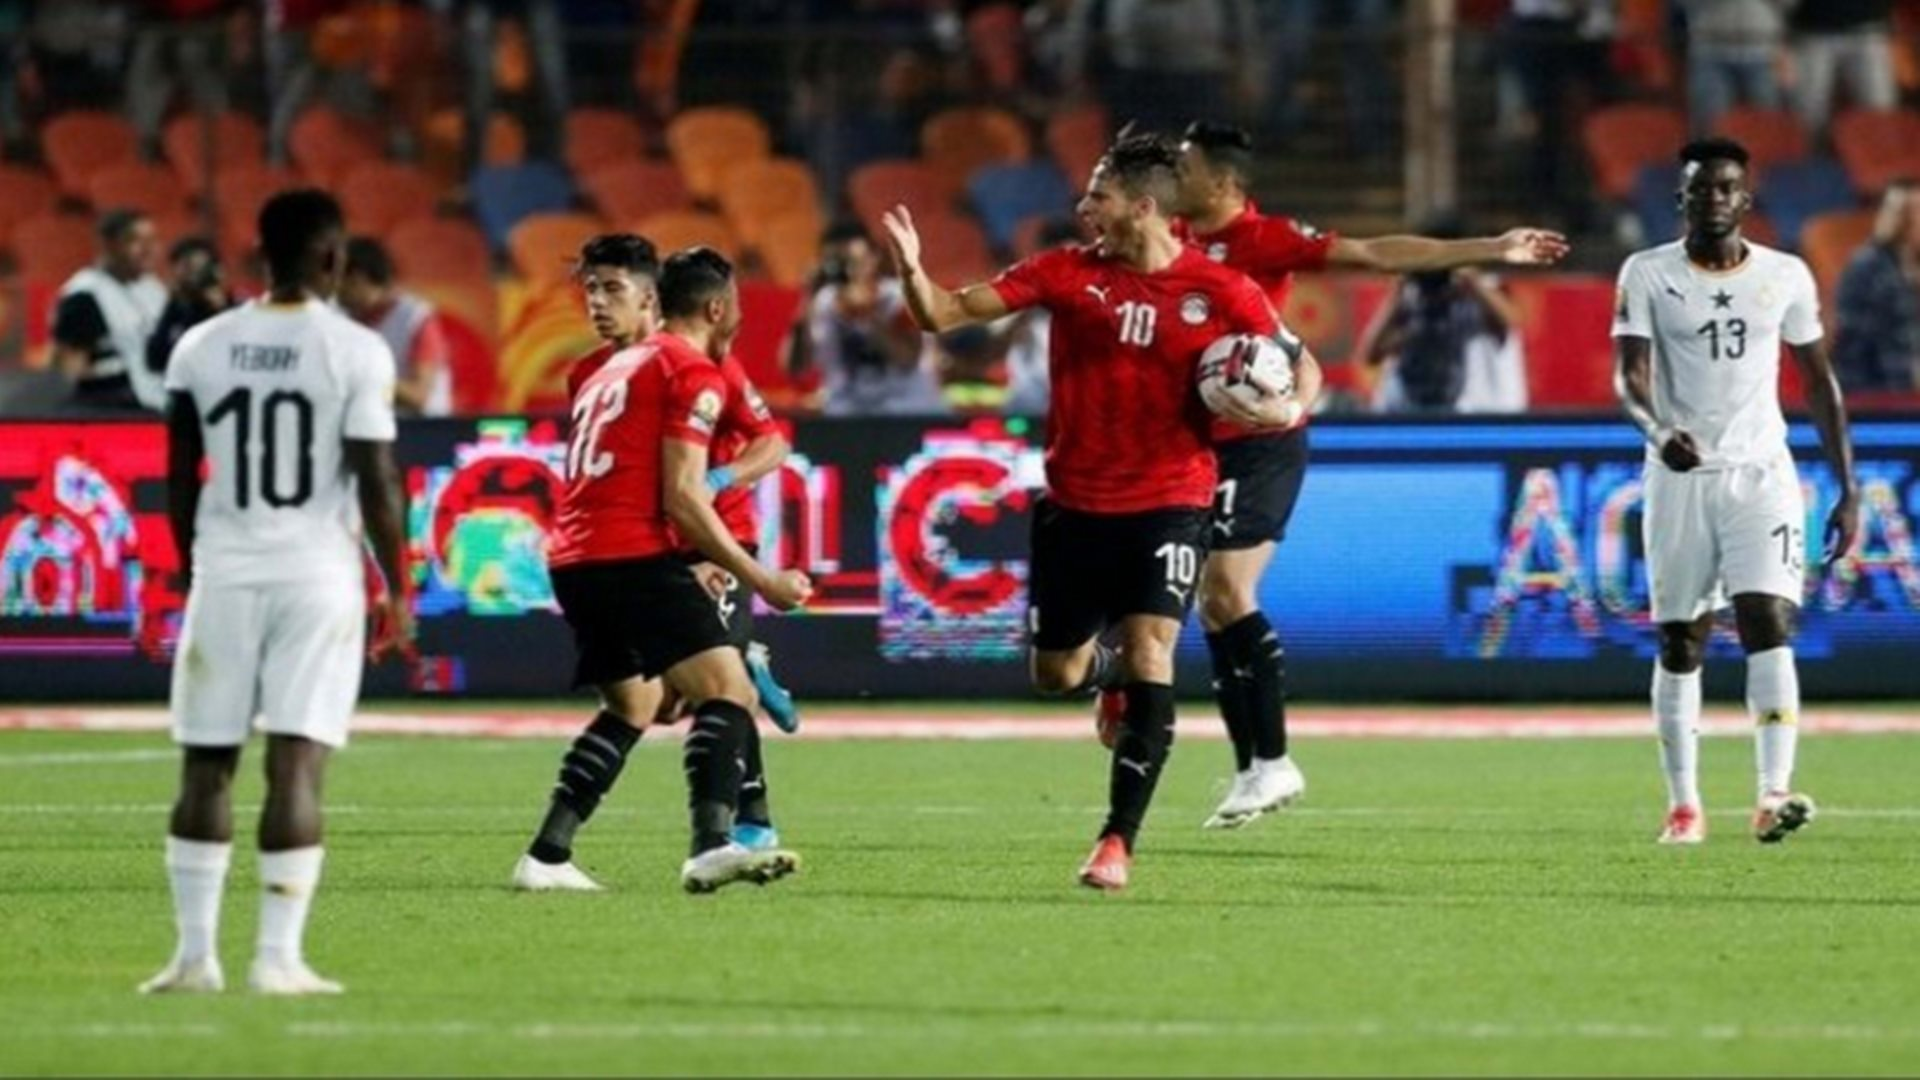 U23 Afcon: Ghana coach Tanko turns to mathematics after Egypt loss